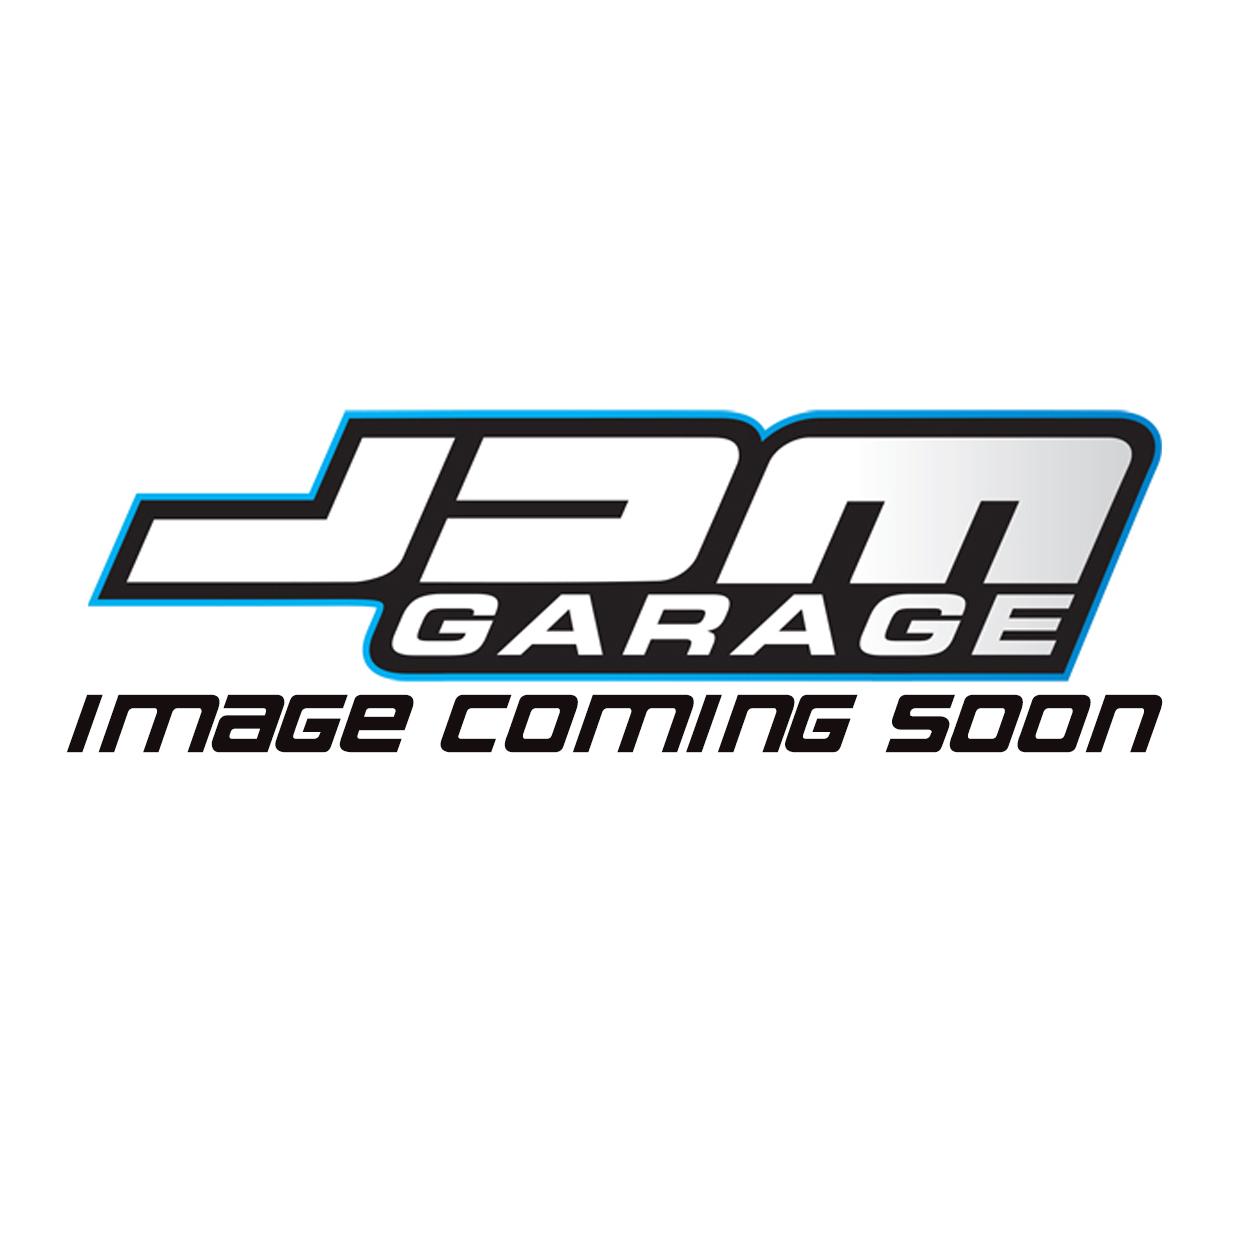 Haltech Elite 1000+ ECU Subaru WRX MY97-98 With Plug 'n' Play Adaptor Harness Kit